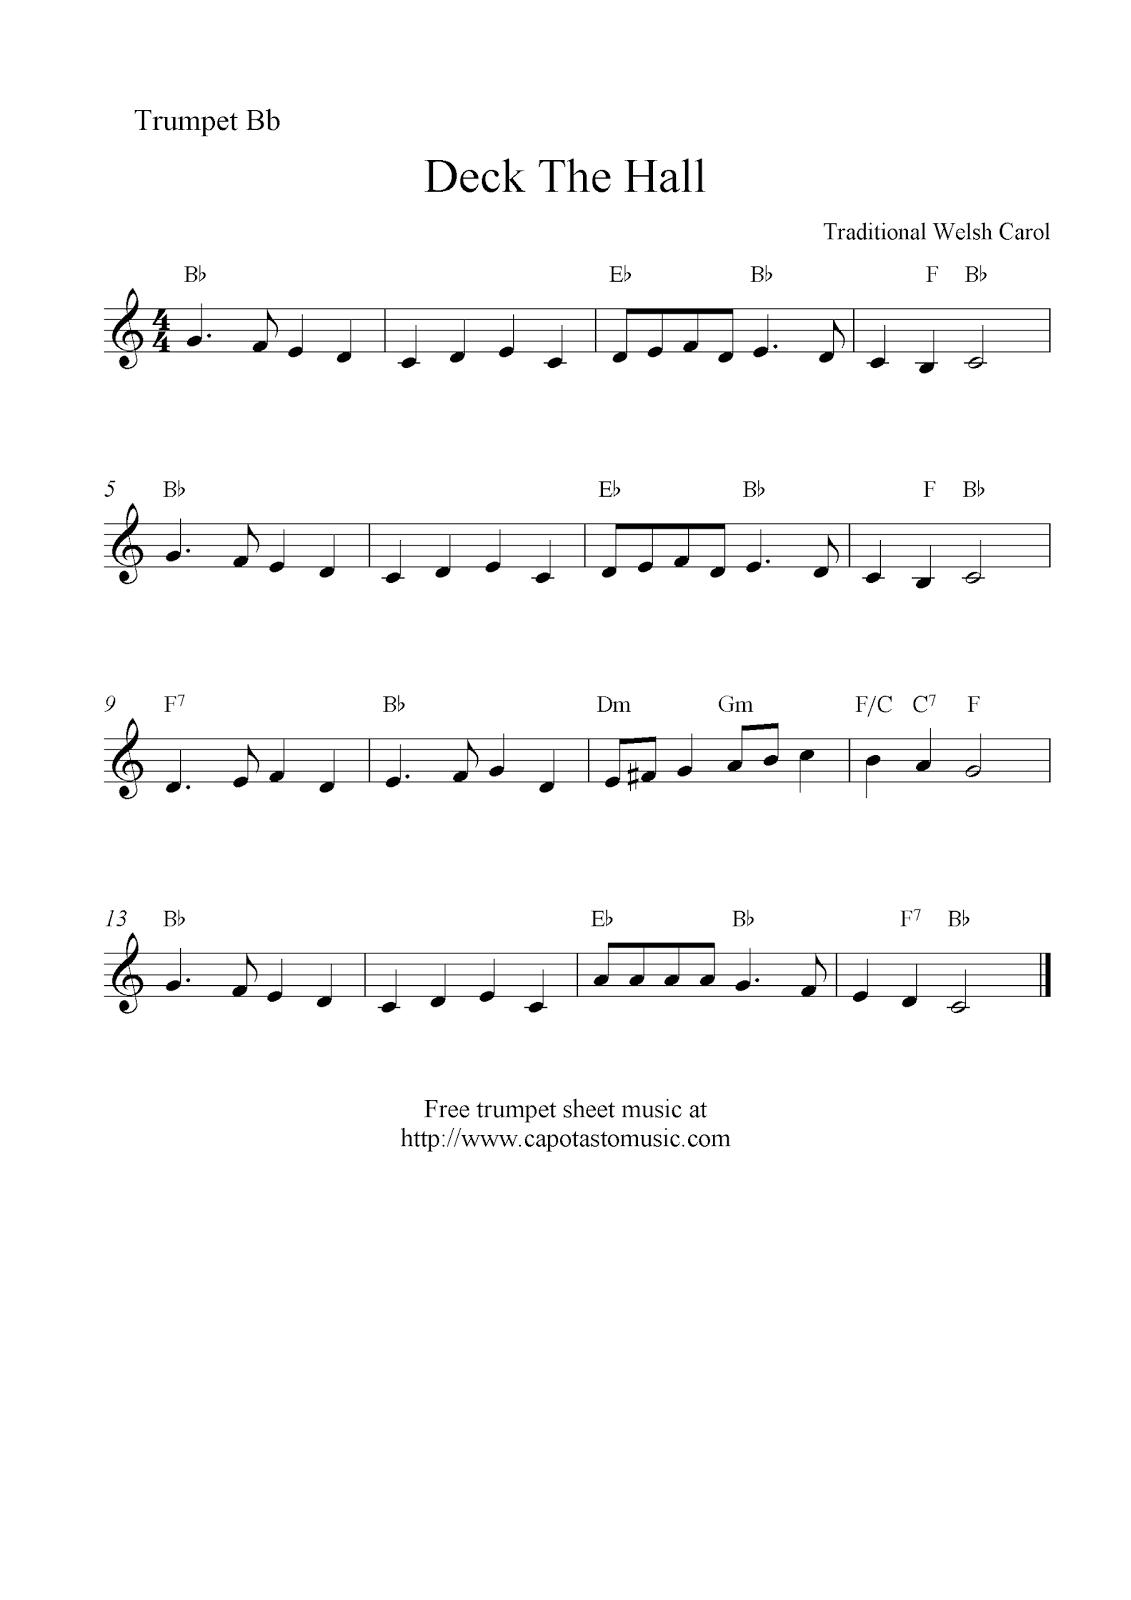 deck the halls free christmas trumpet sheet music - Free Christmas Sheet Music